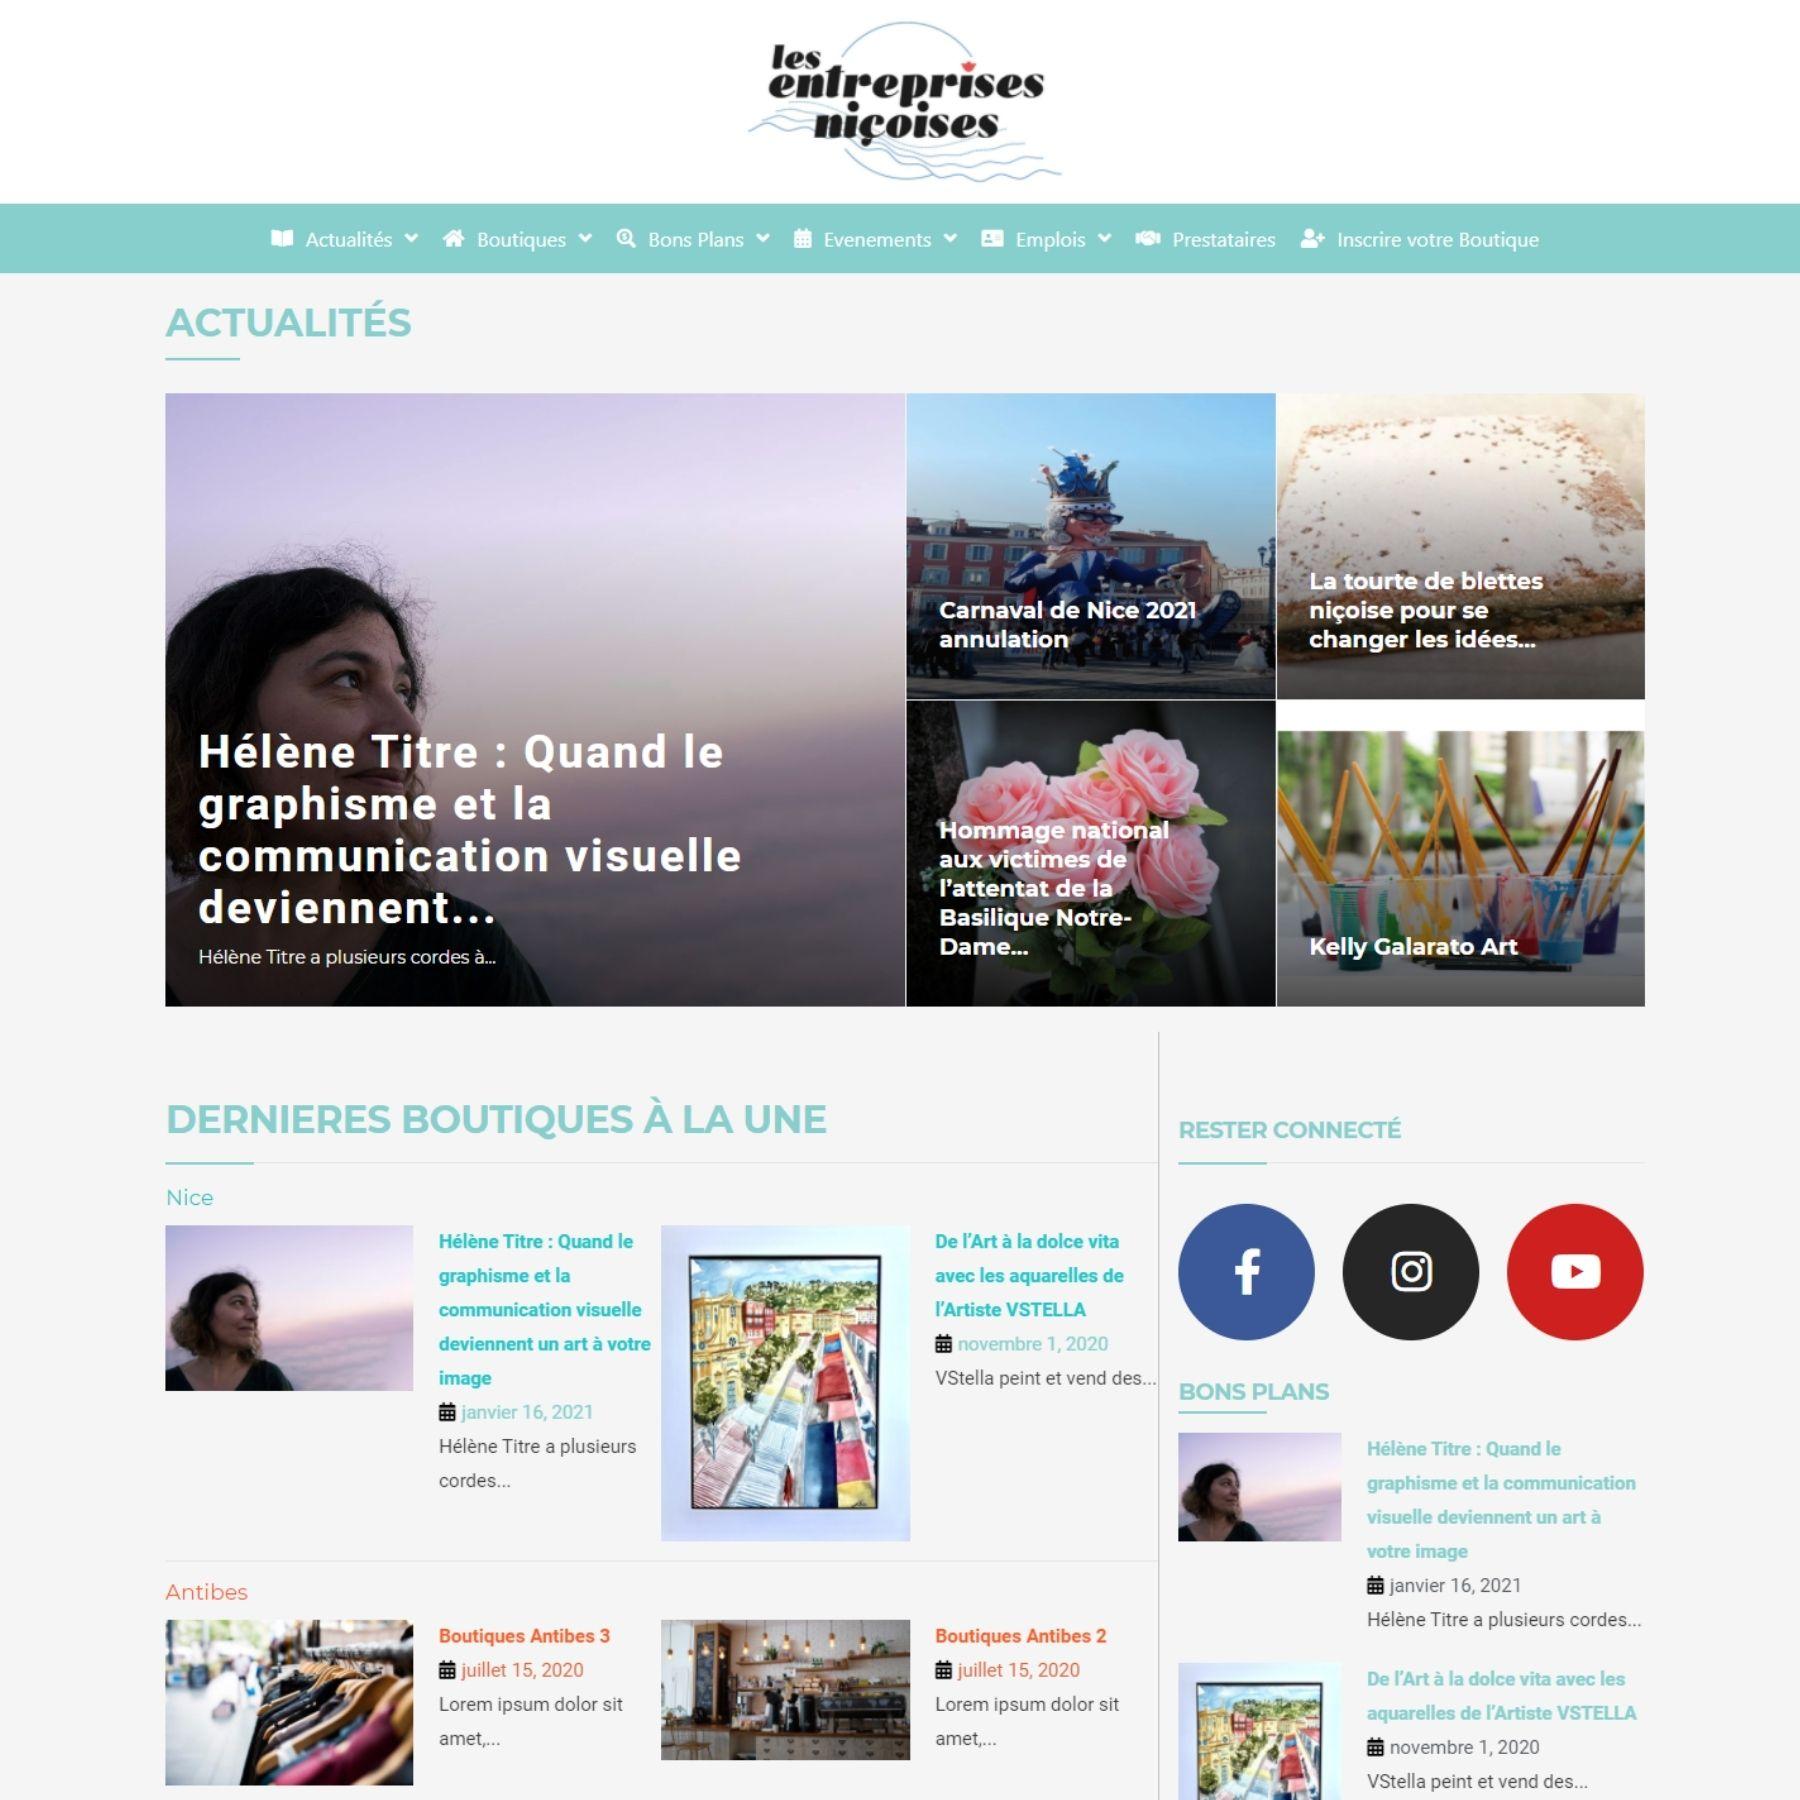 création site internet - screenshot - lesentreprisesnicoises